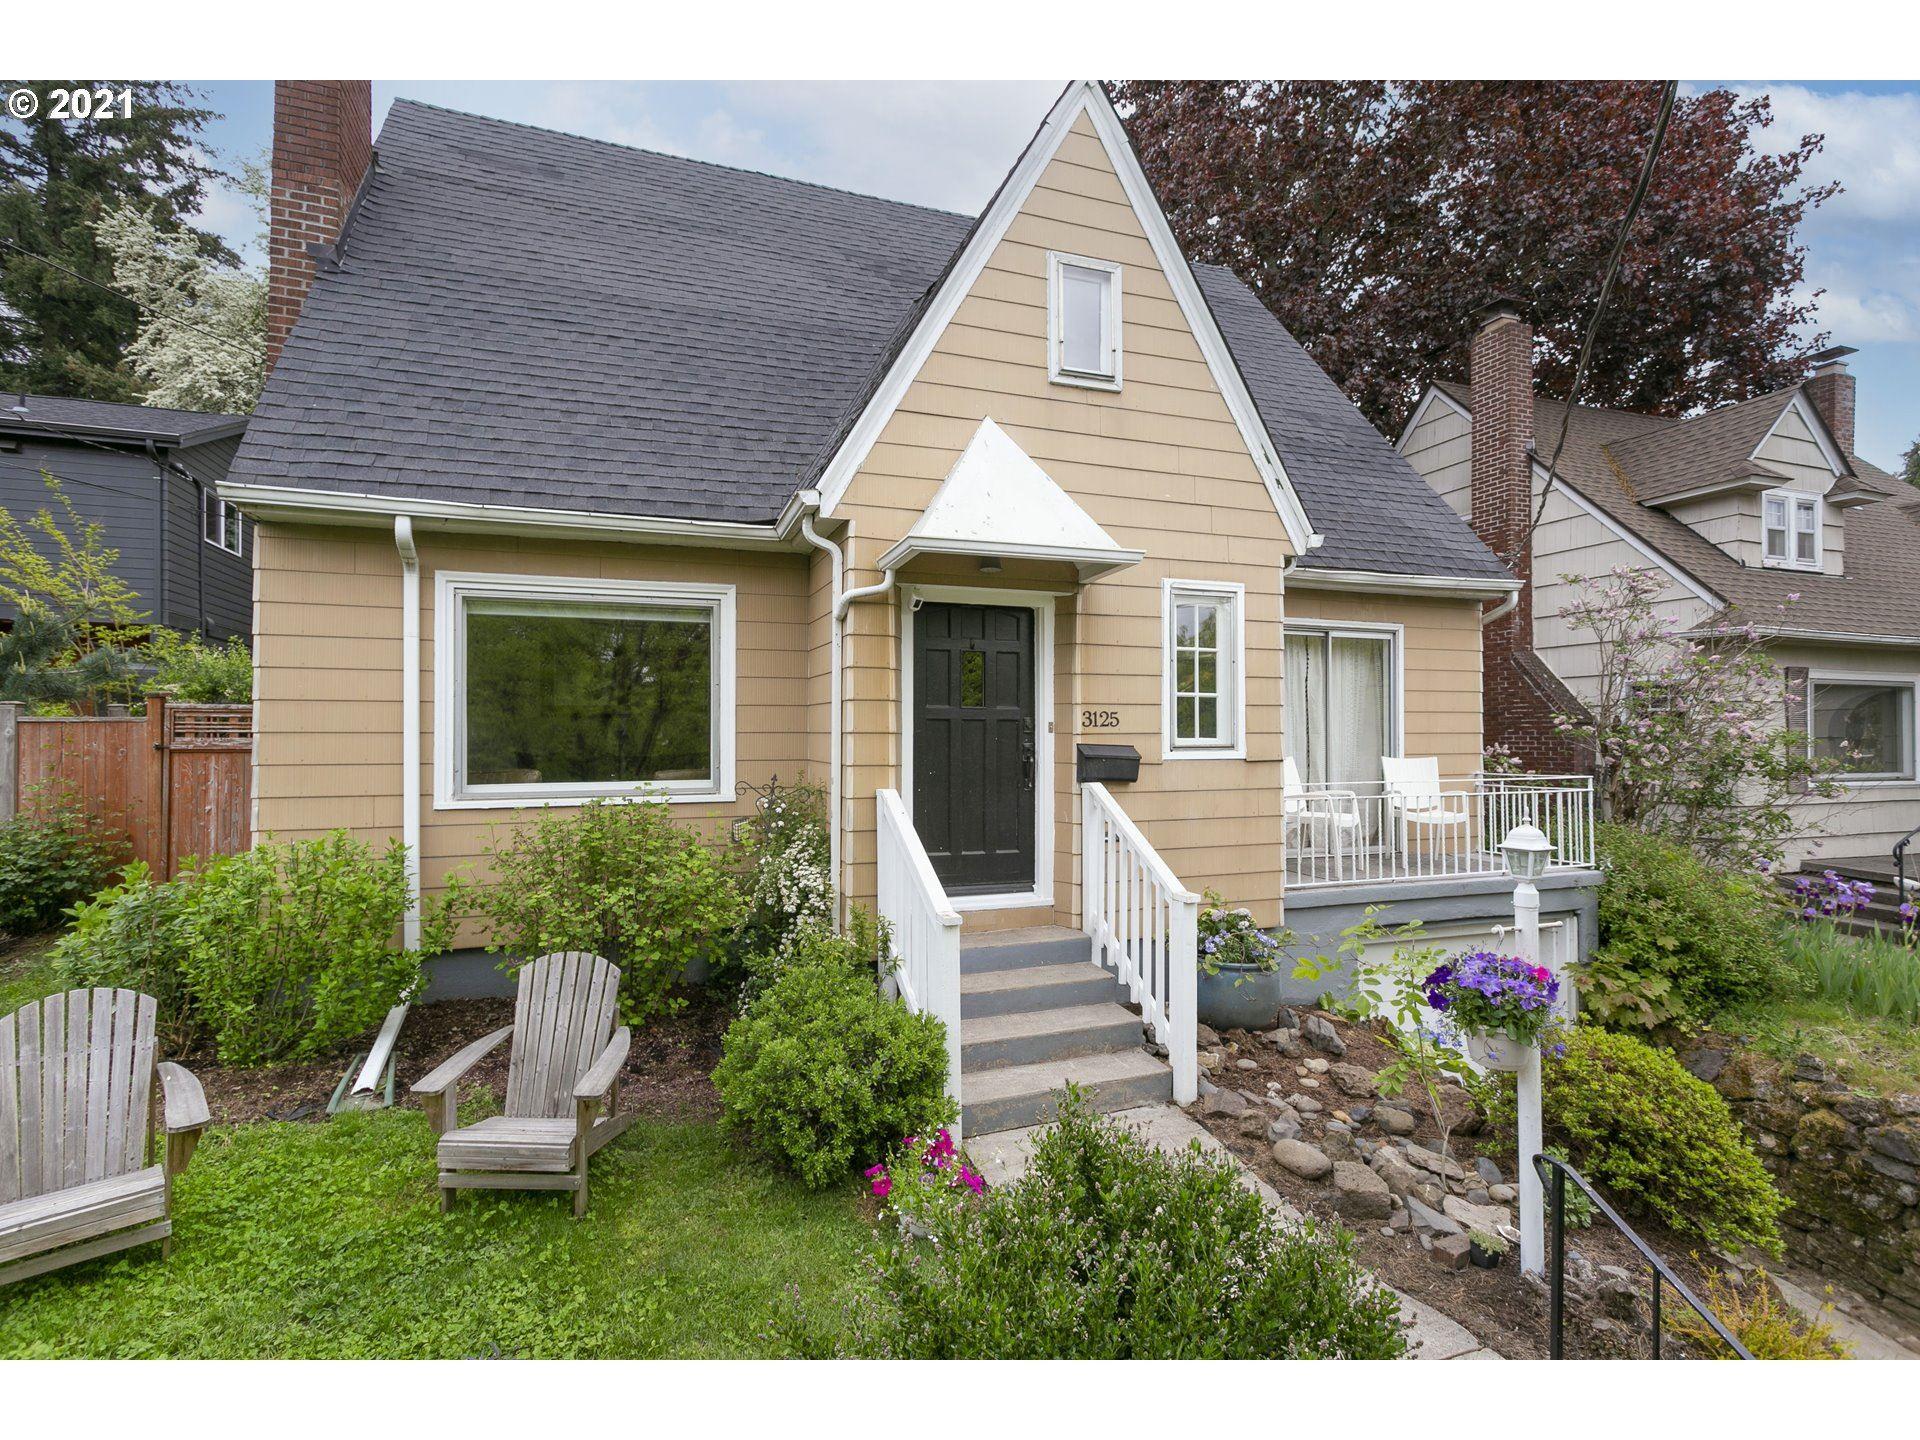 3125 SE LINCOLN ST, Portland, OR 97214 - MLS#: 21654662